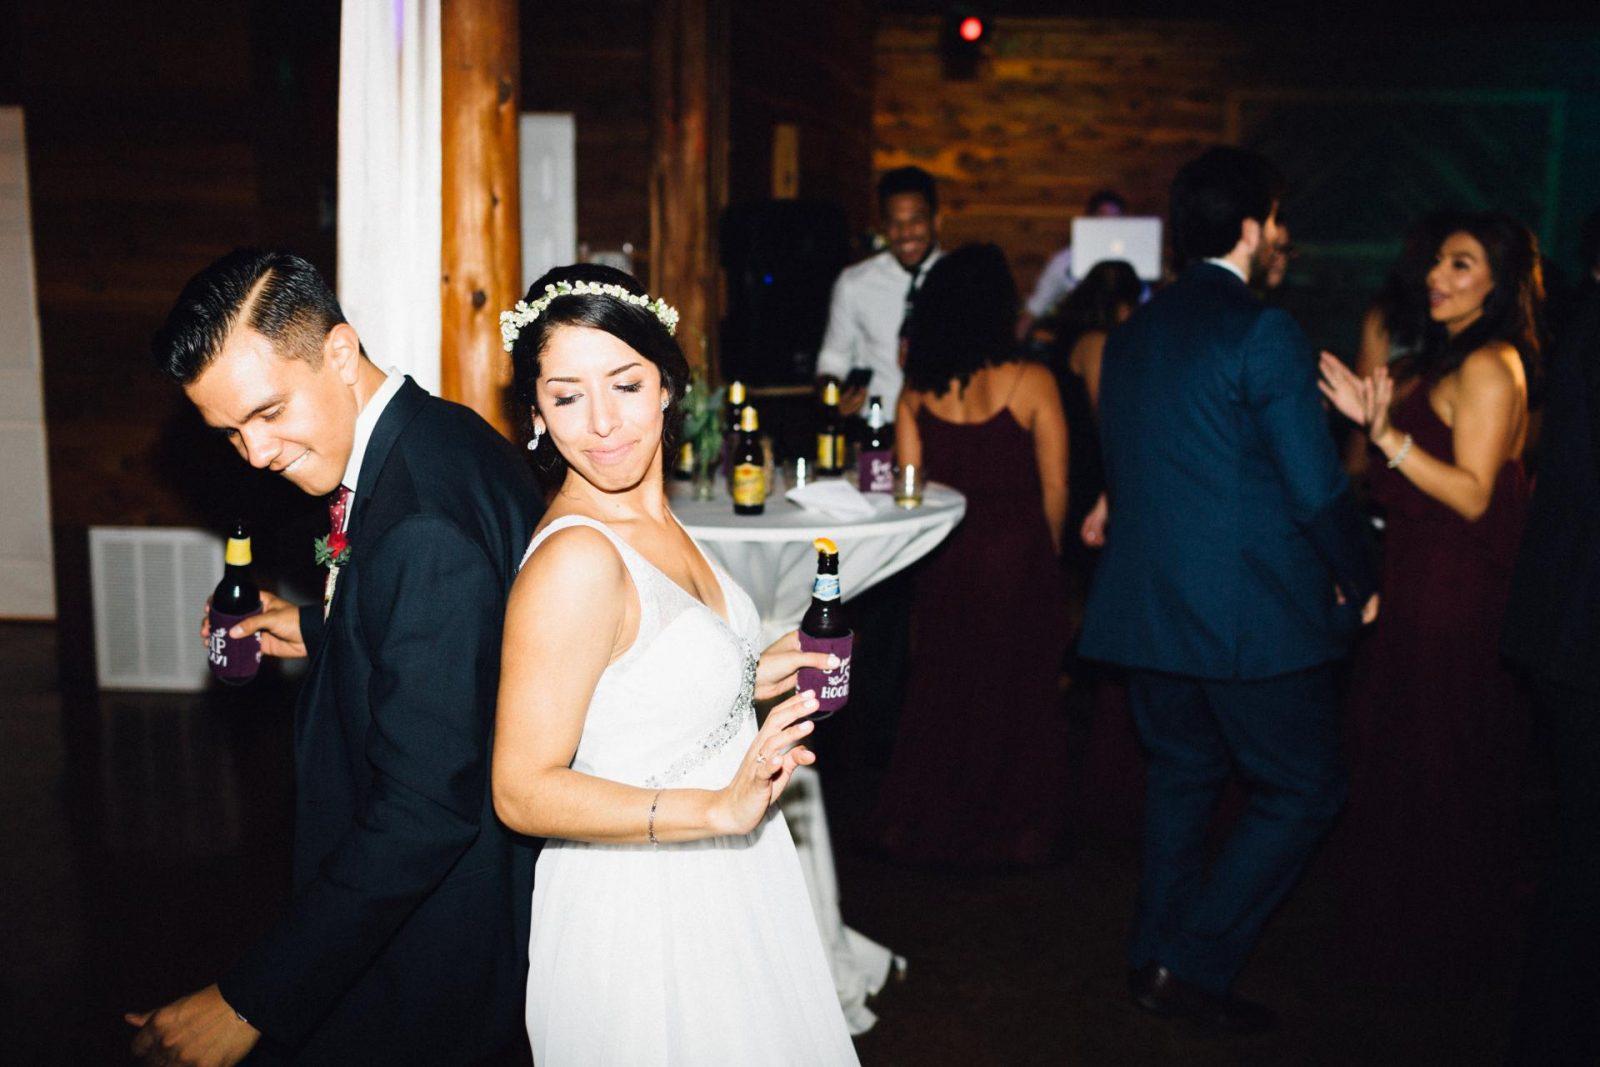 D & E Wedding Part IV: The Reception